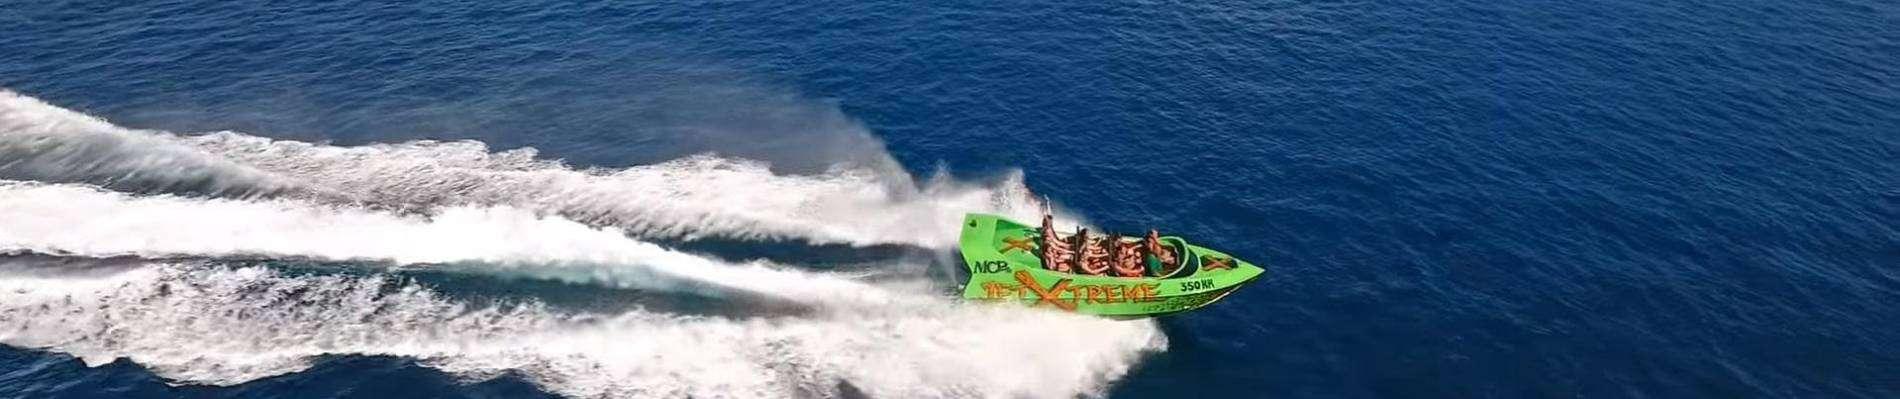 jet boat split croatia tour